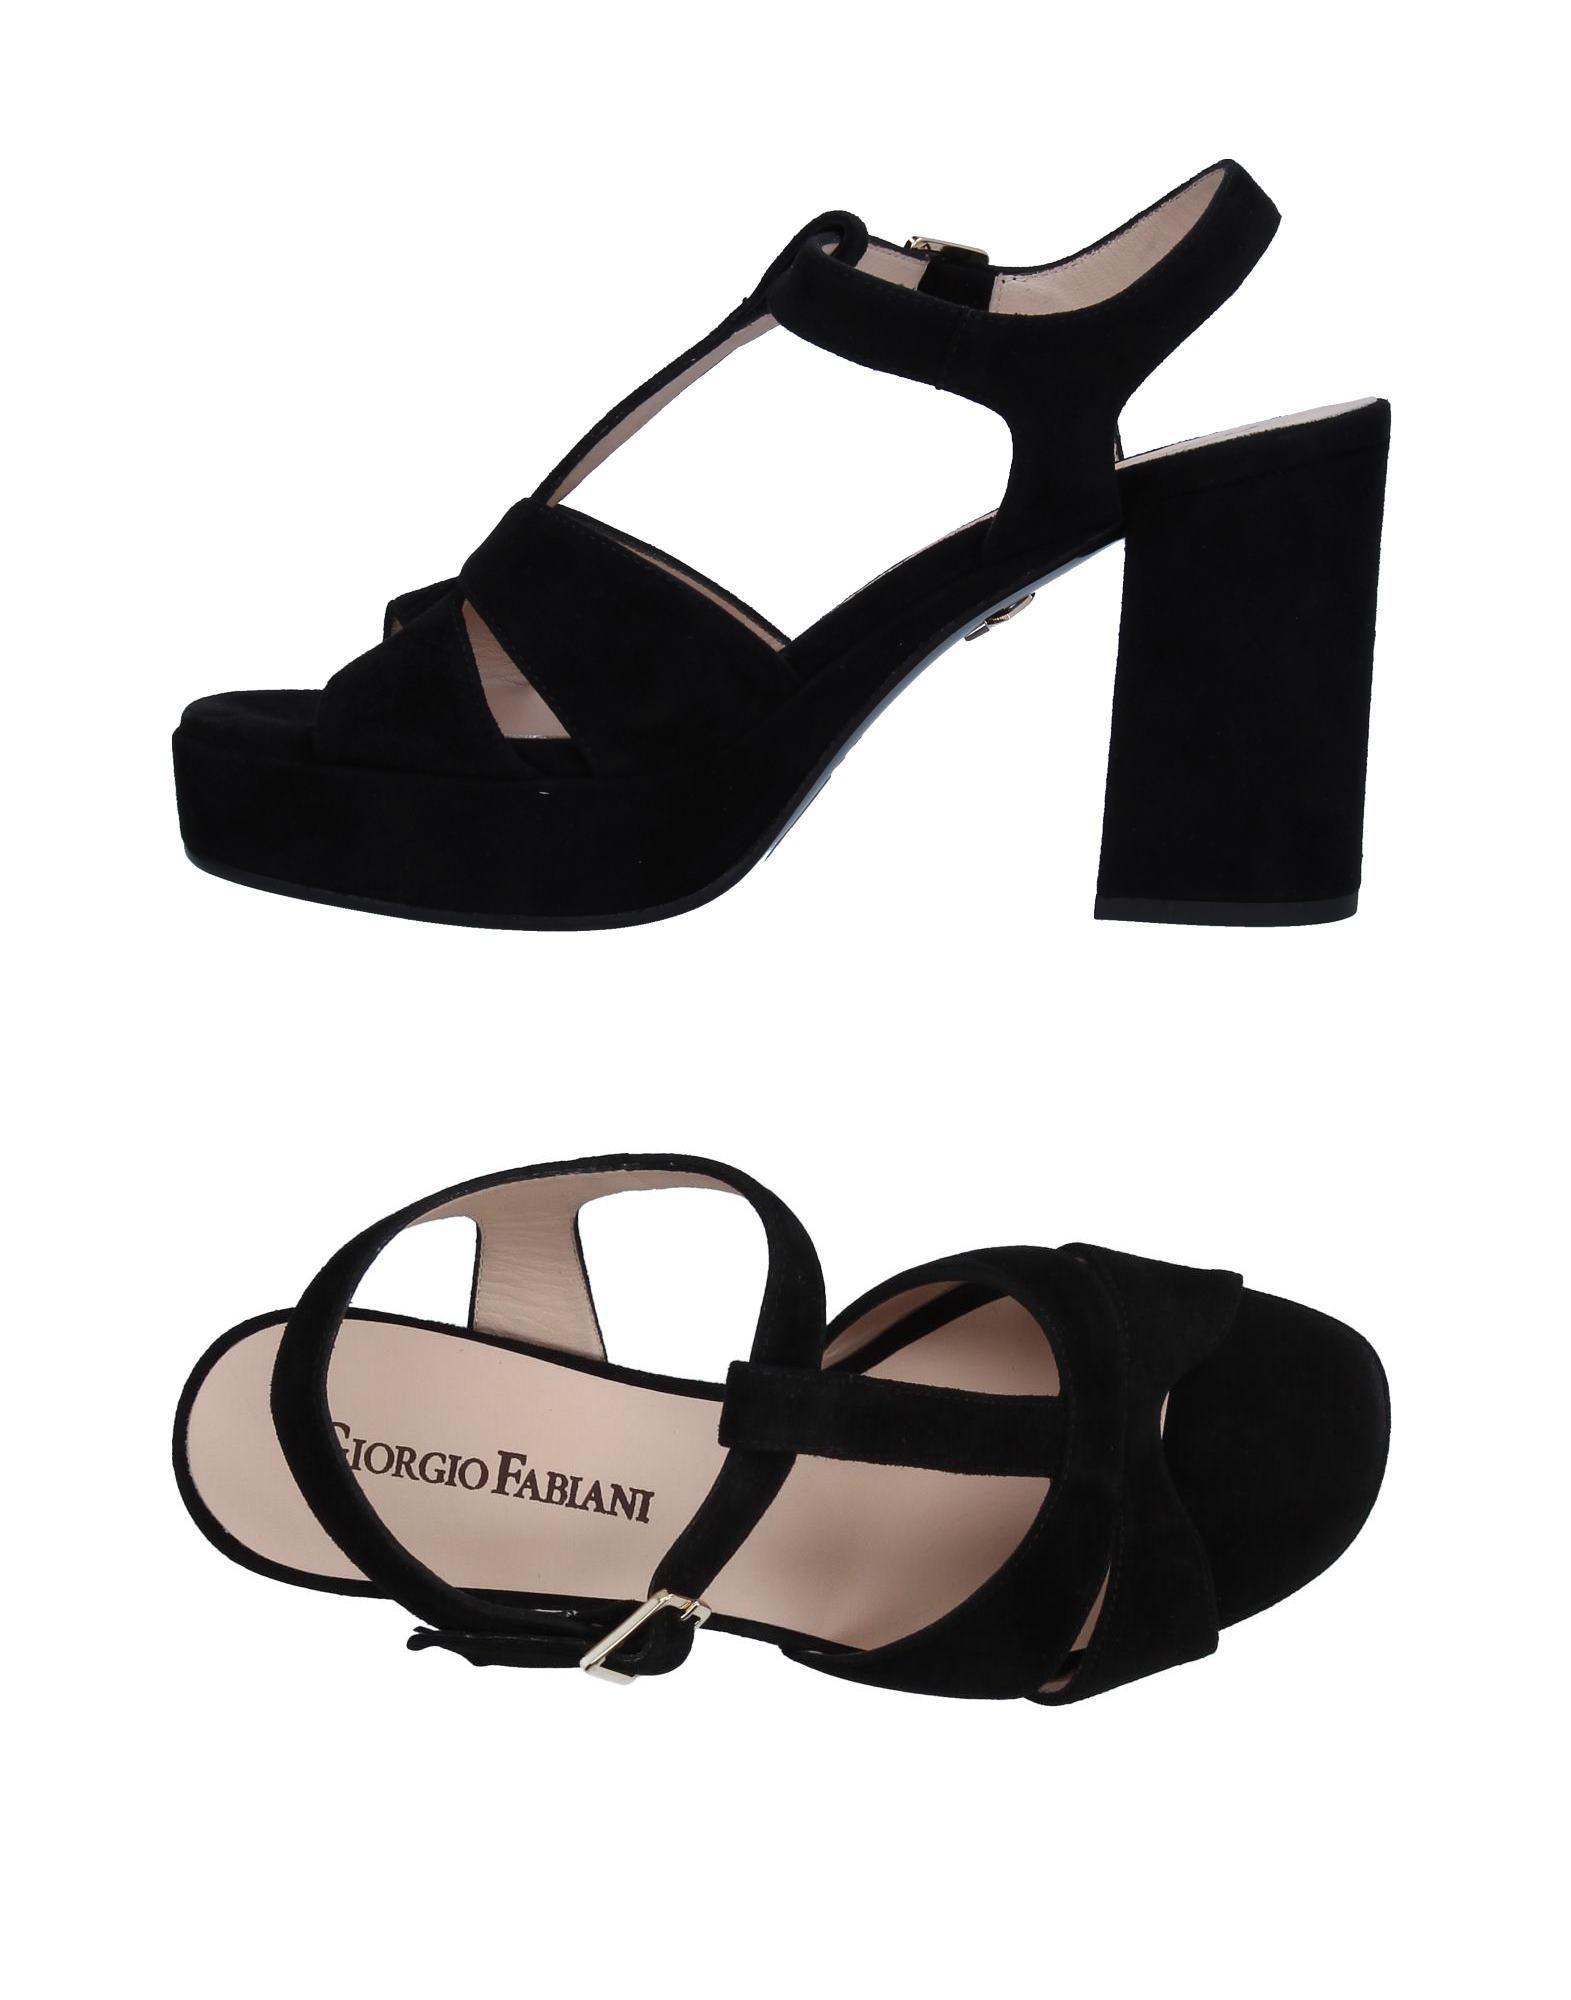 Giorgio Fabiani Sandalen Damen  11332895SF Gute Qualität beliebte Schuhe